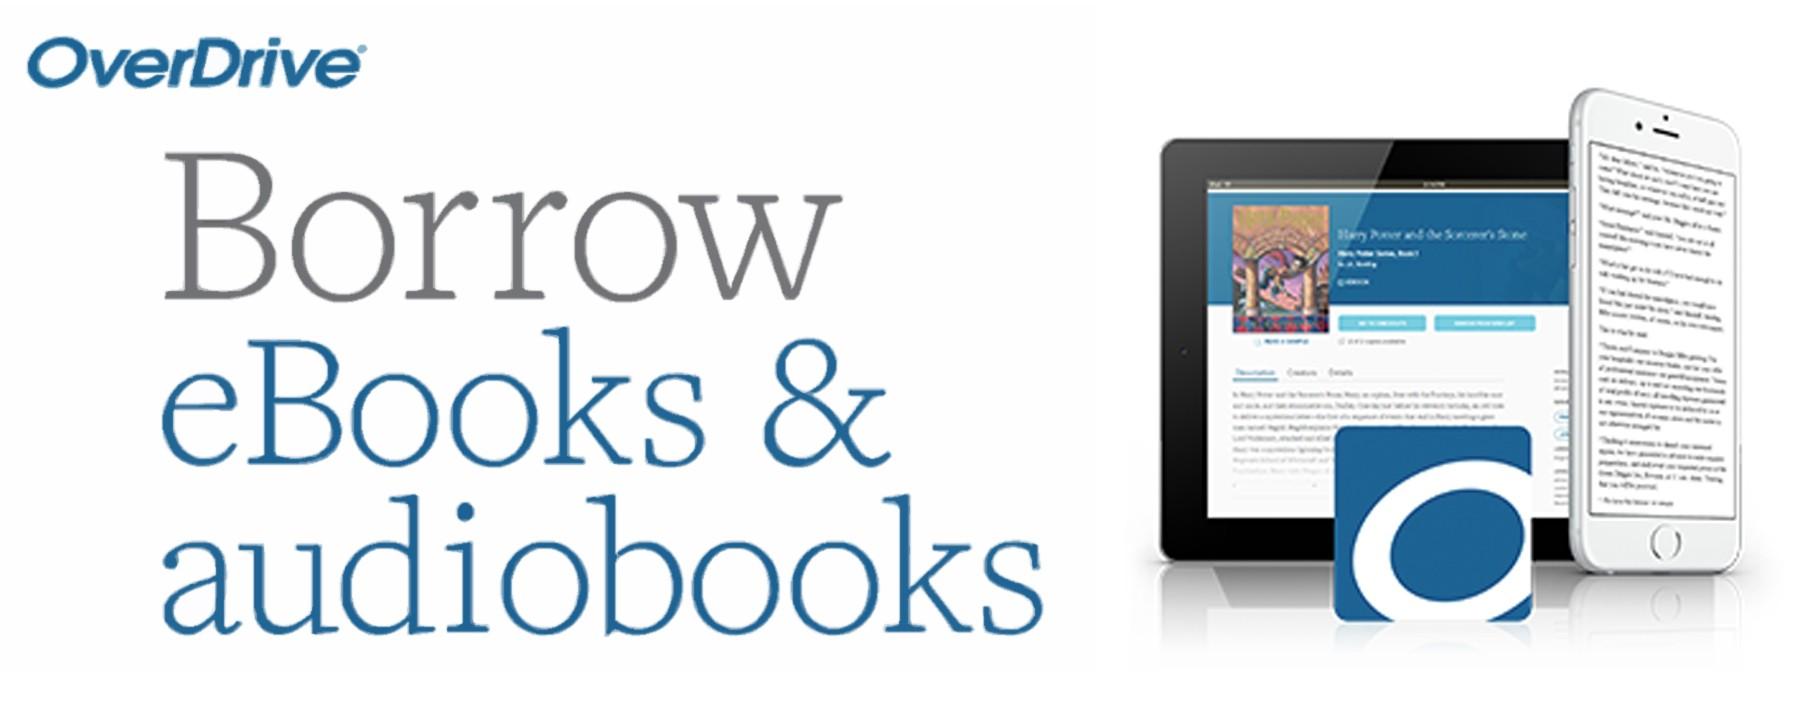 OverDrive - Borrow eBooks and Audiobooks